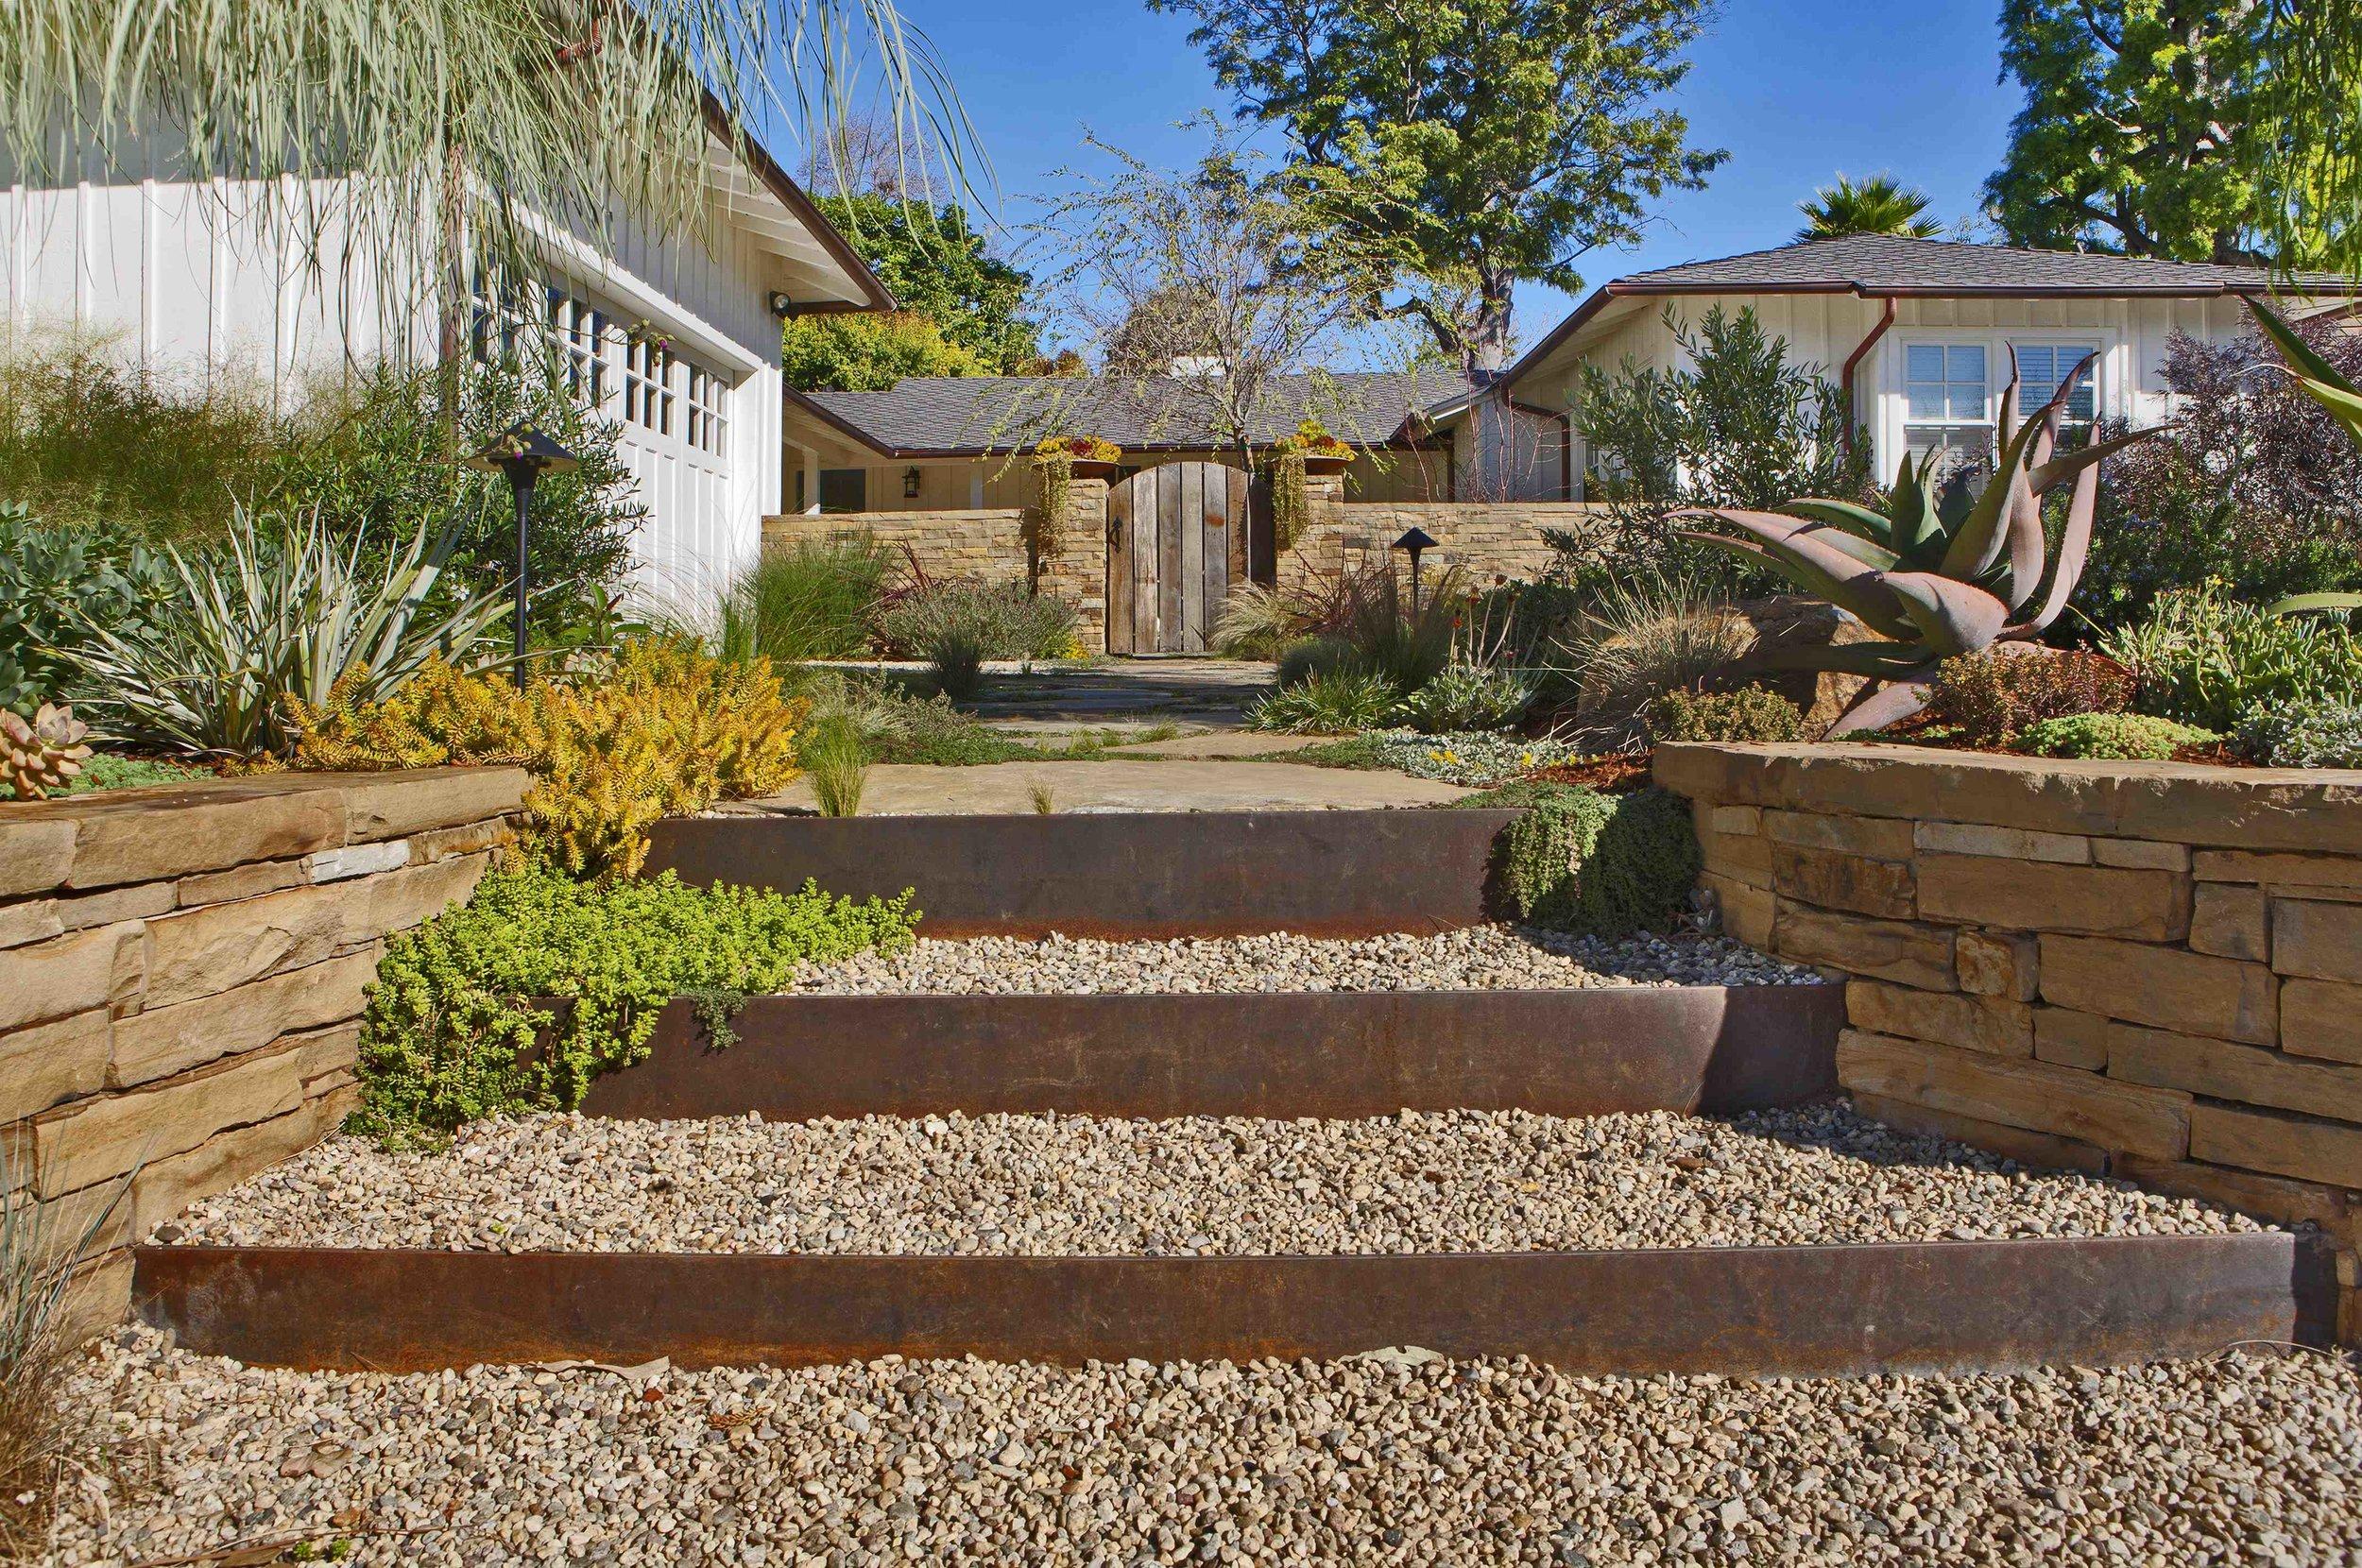 project-olsen-brentwood-steel-steps.jpg